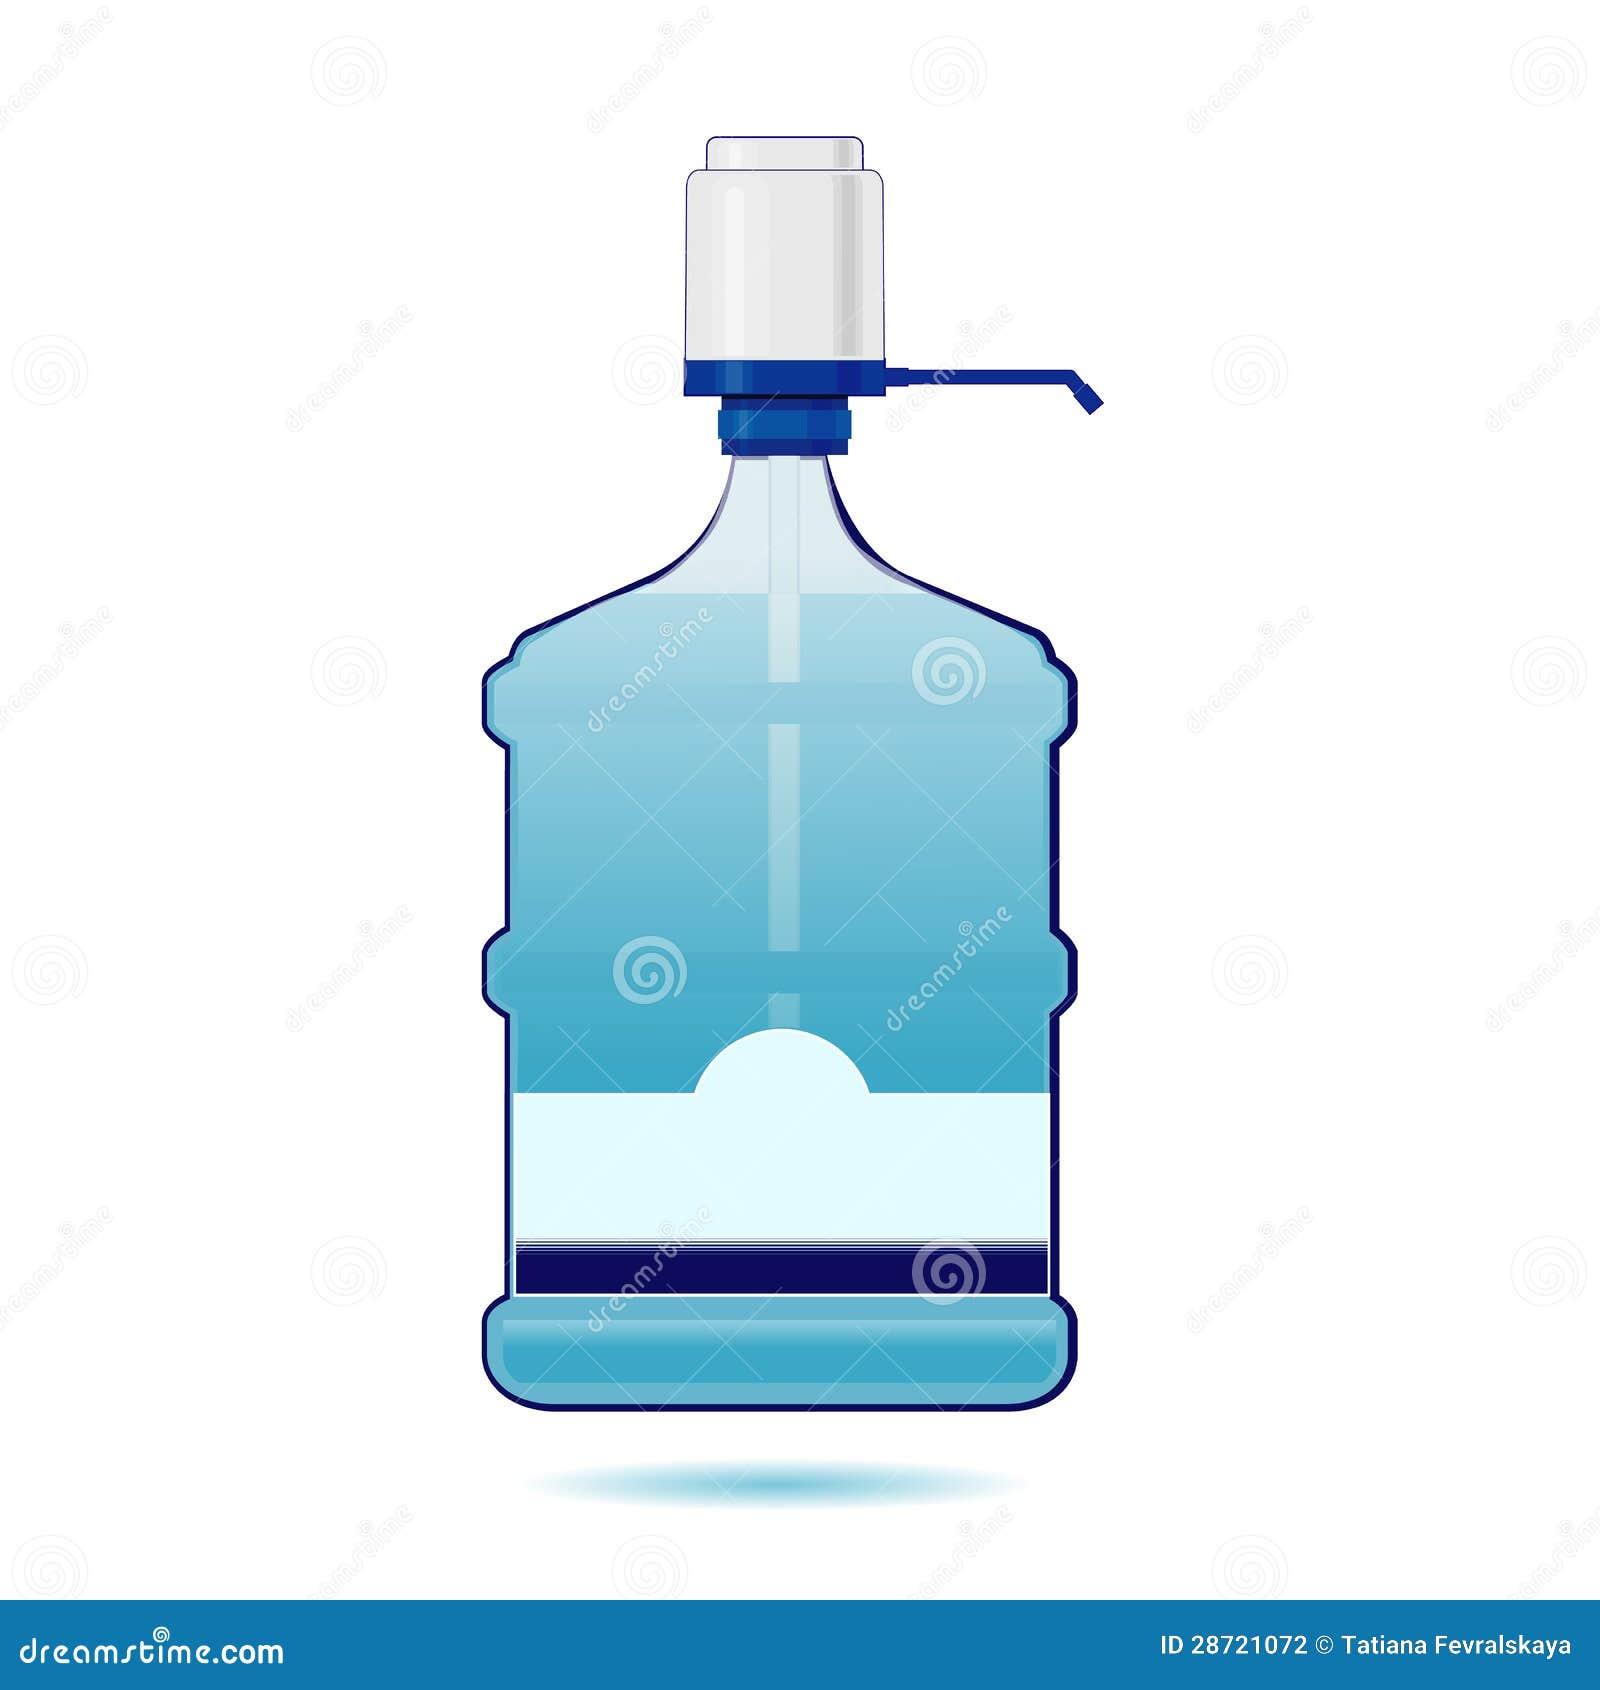 water cooler business plan